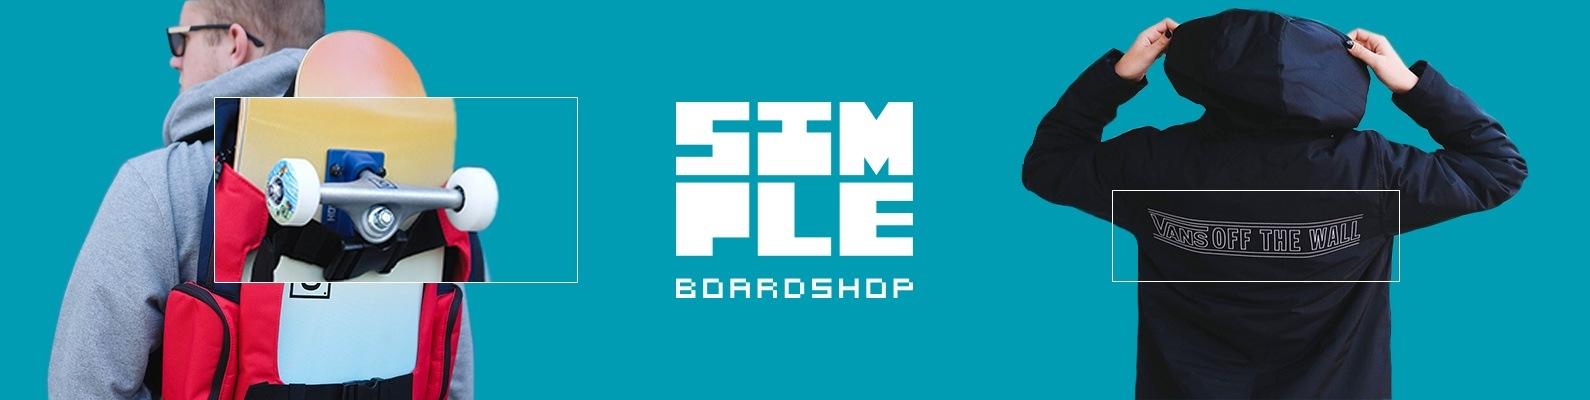 1e1f9925 Simple Boardshop | Одежда, обувь, скейтборды | ВКонтакте